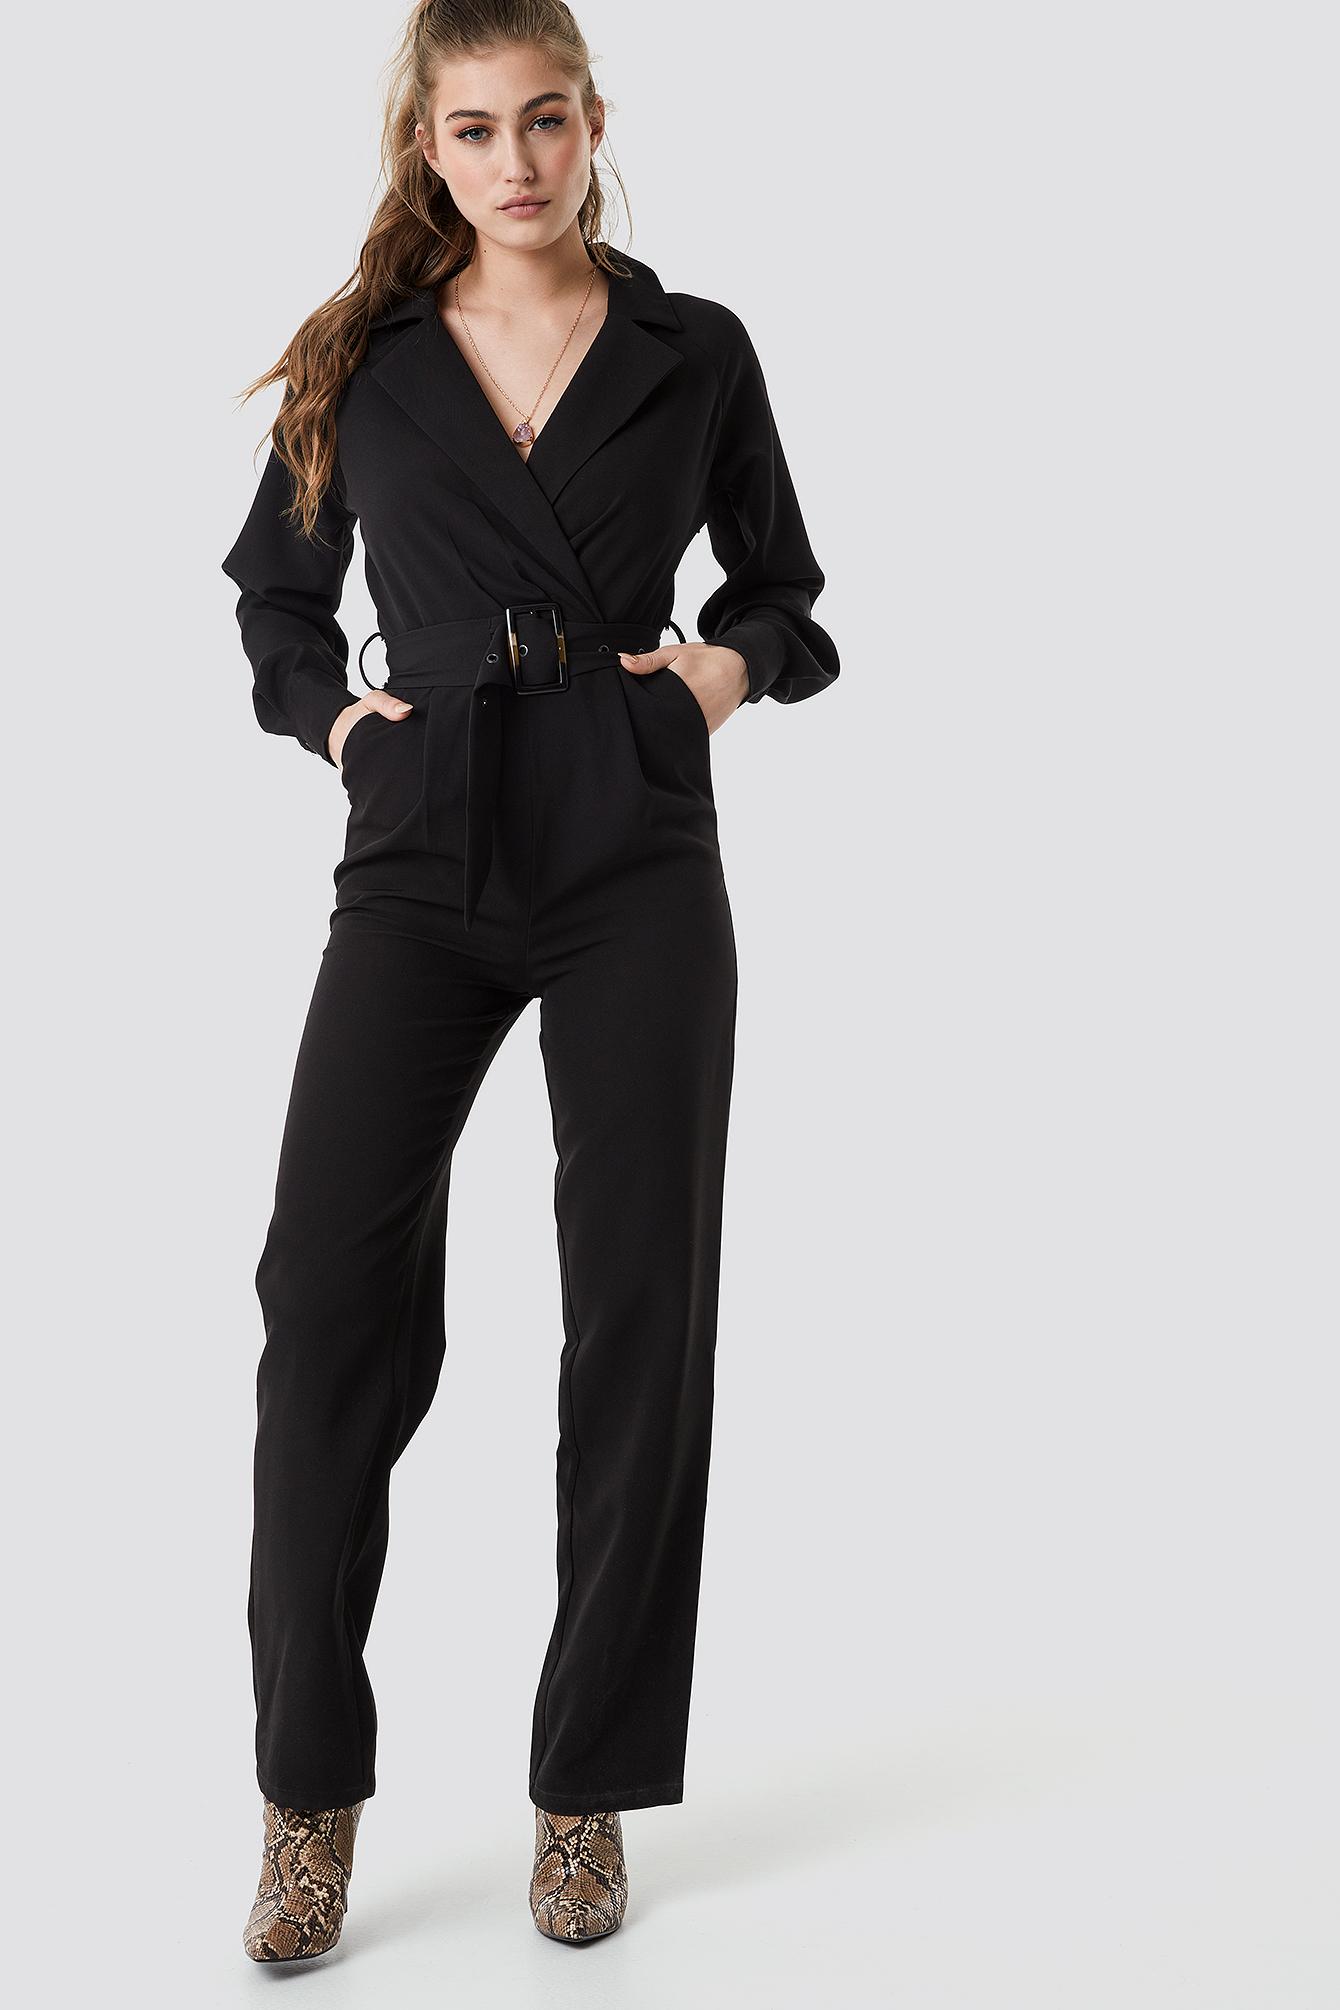 Belted Waist Collar Jumpsuit NA-KD.COM